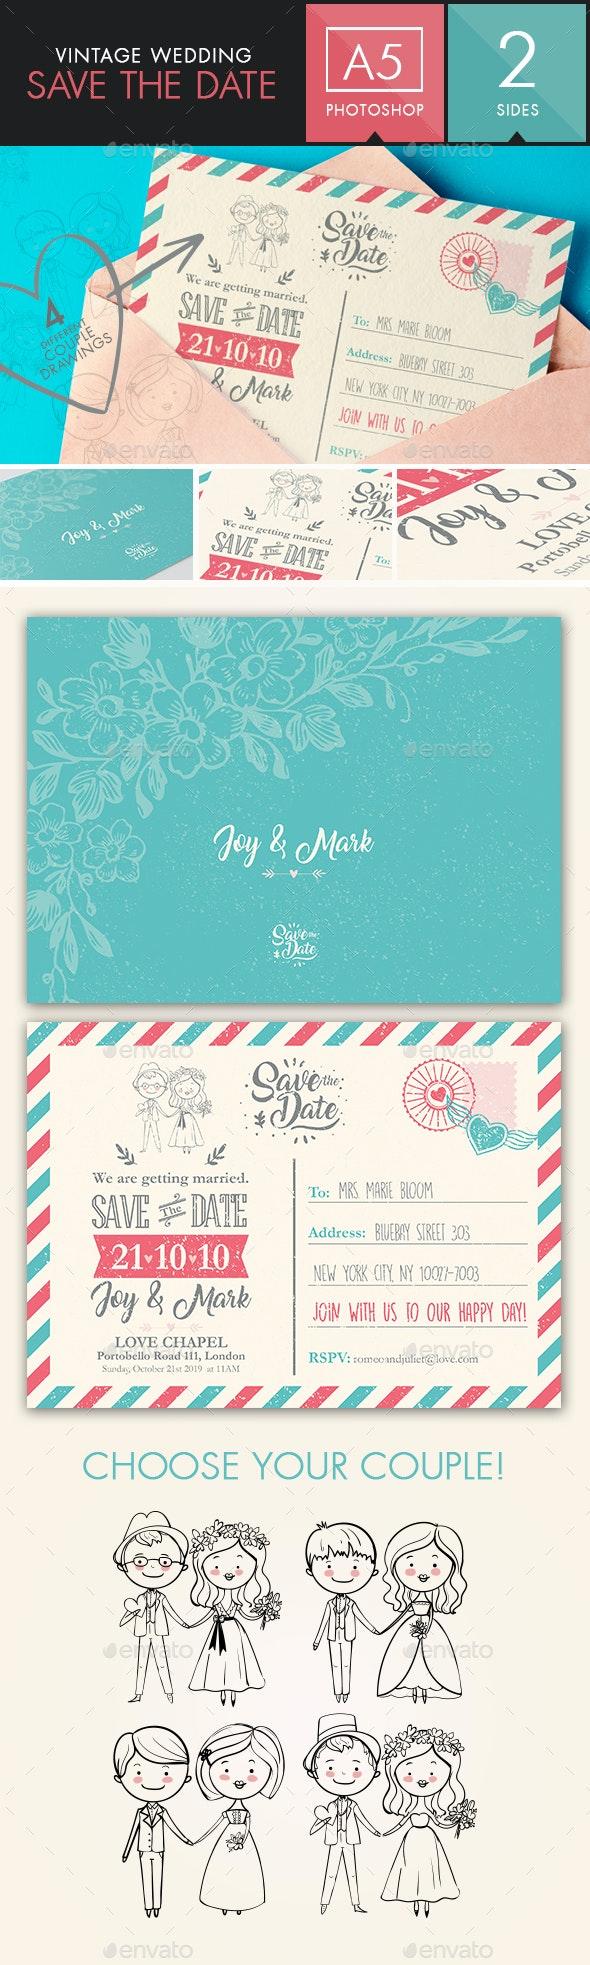 Save the Date - Vintage Wedding Postcard - Weddings Cards & Invites